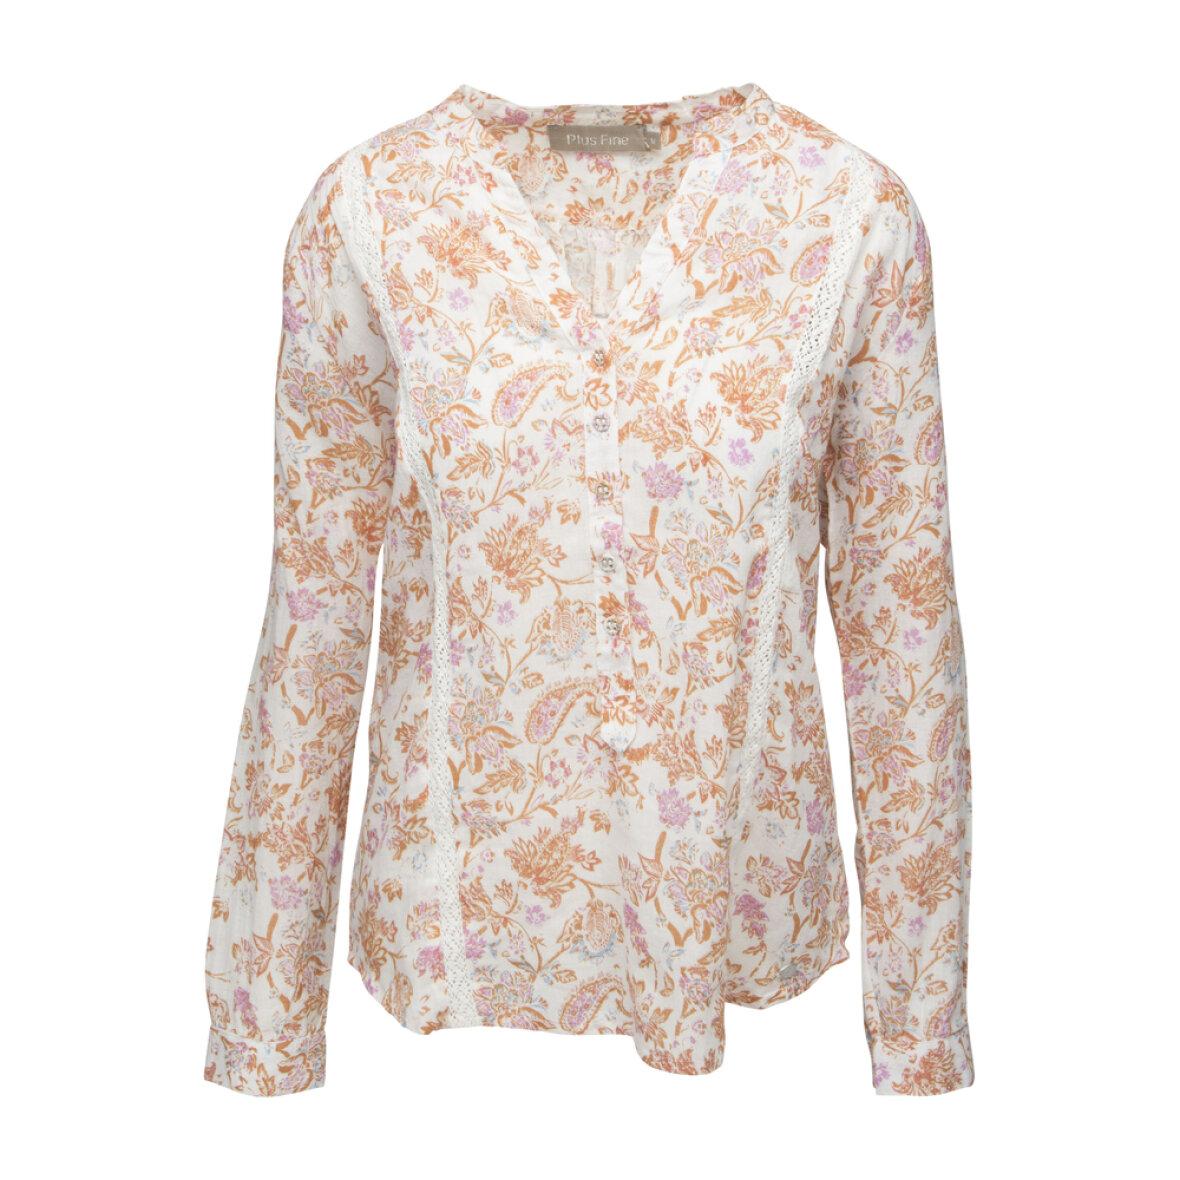 c086cfa0c5fe New York Aabenraa Skjorte D - Fine Cph - Plus Fine Almiras blouse